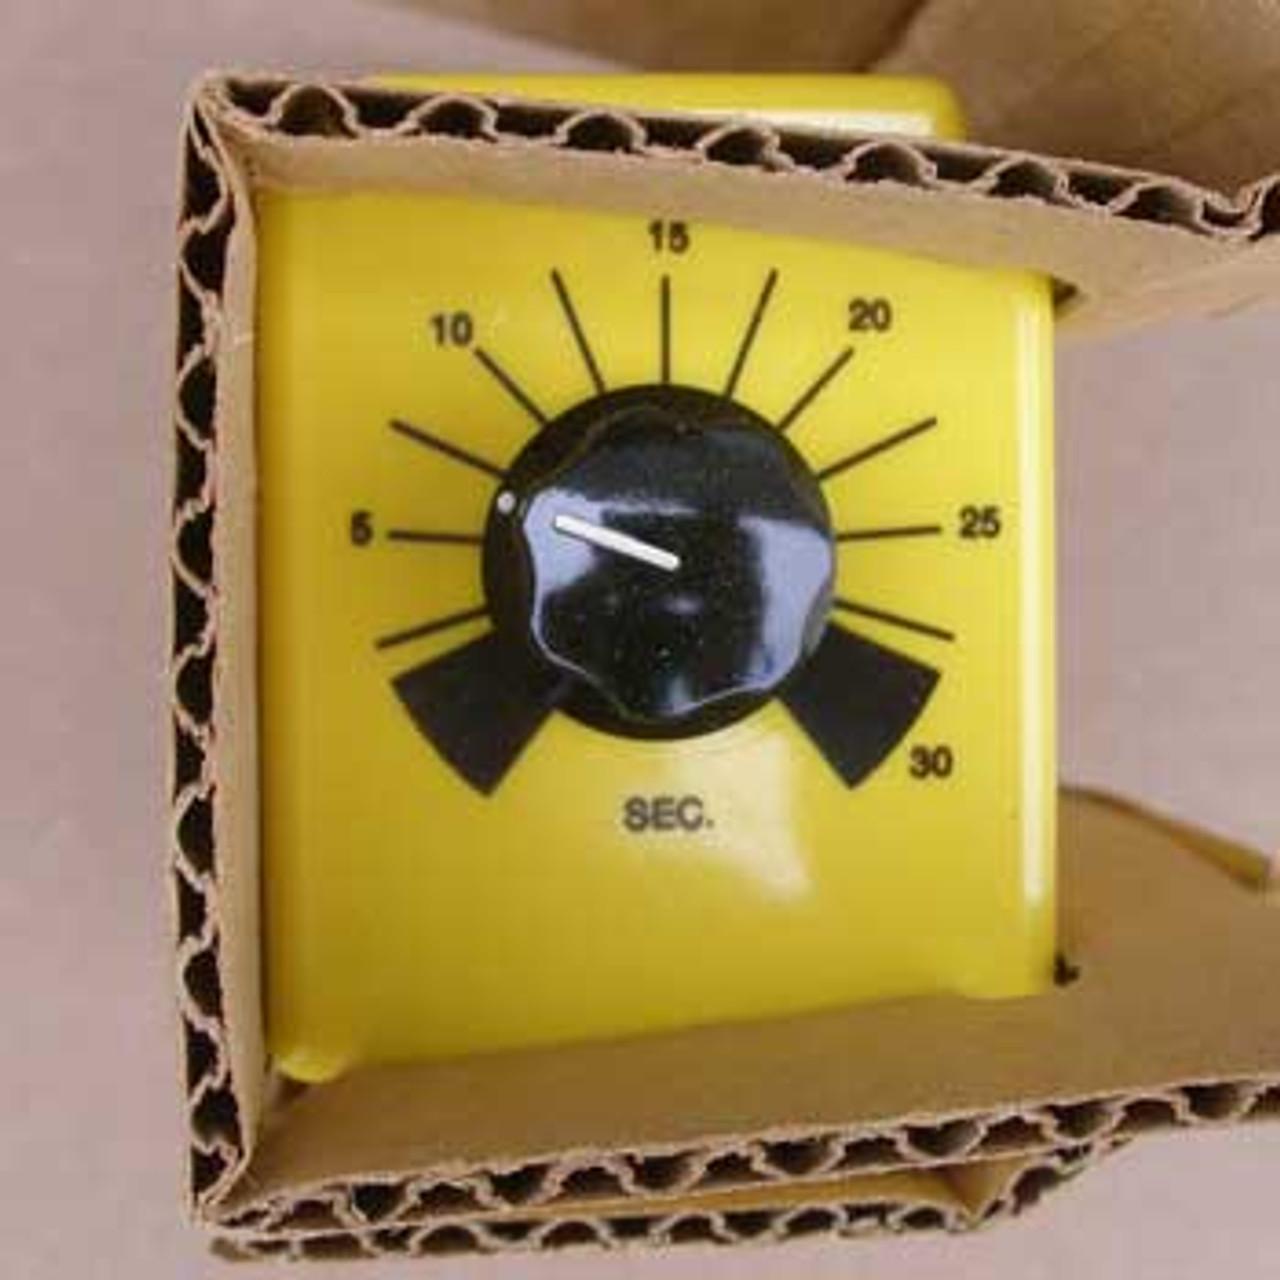 Potter & Brumfield CDB-38-70006 240V Time Delay Relay - New